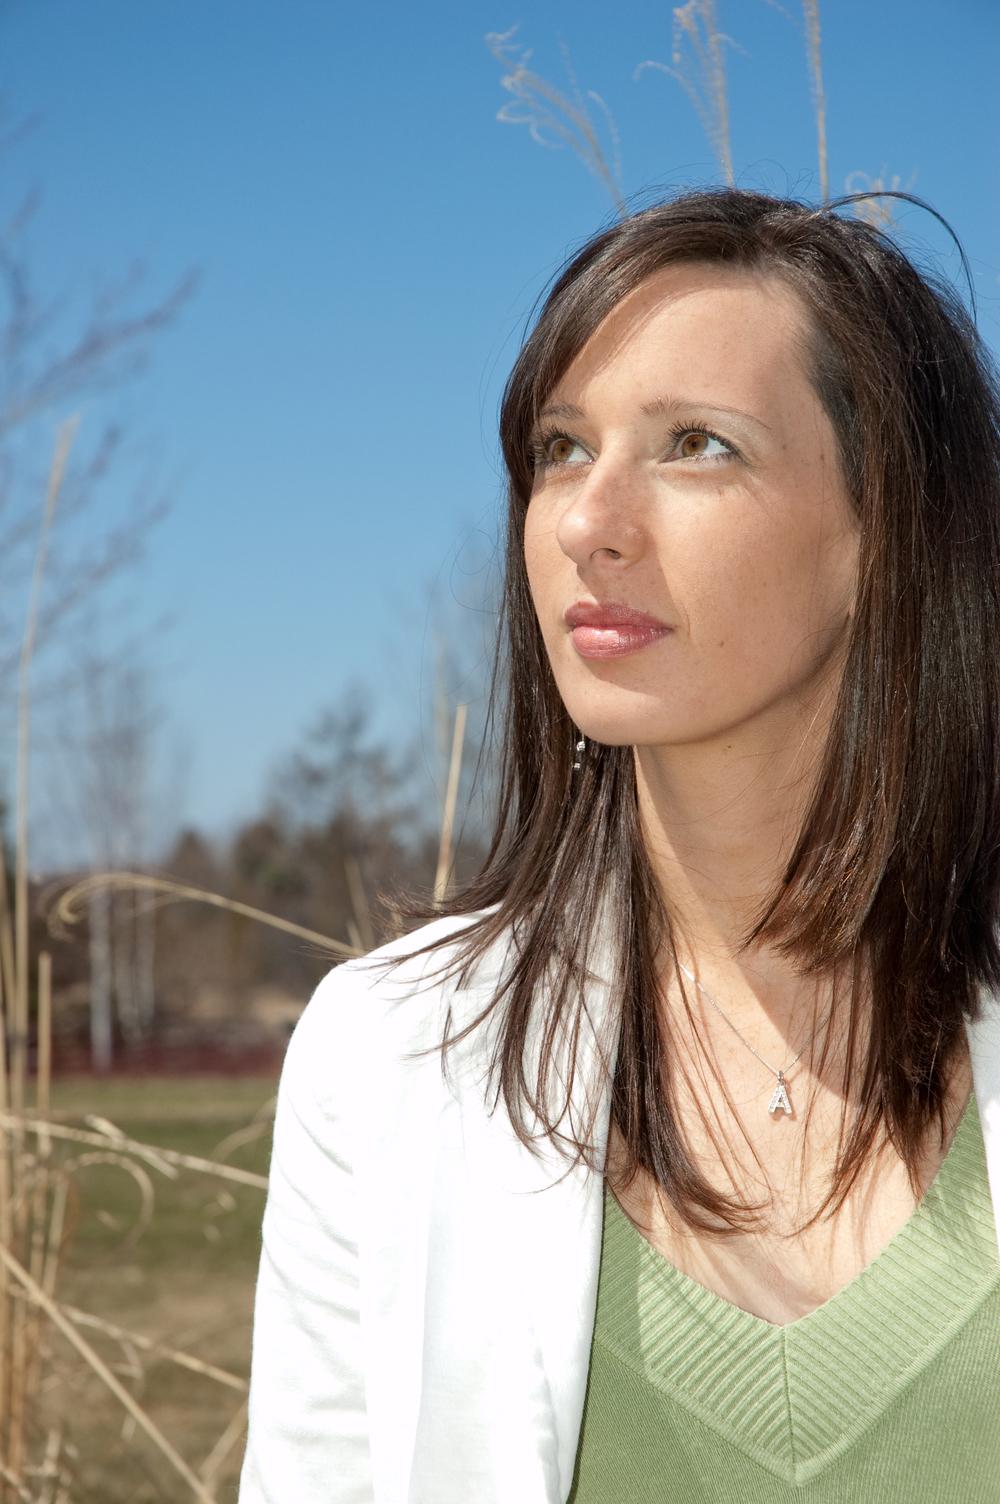 AmandaFerguson_20060408_2291.jpg